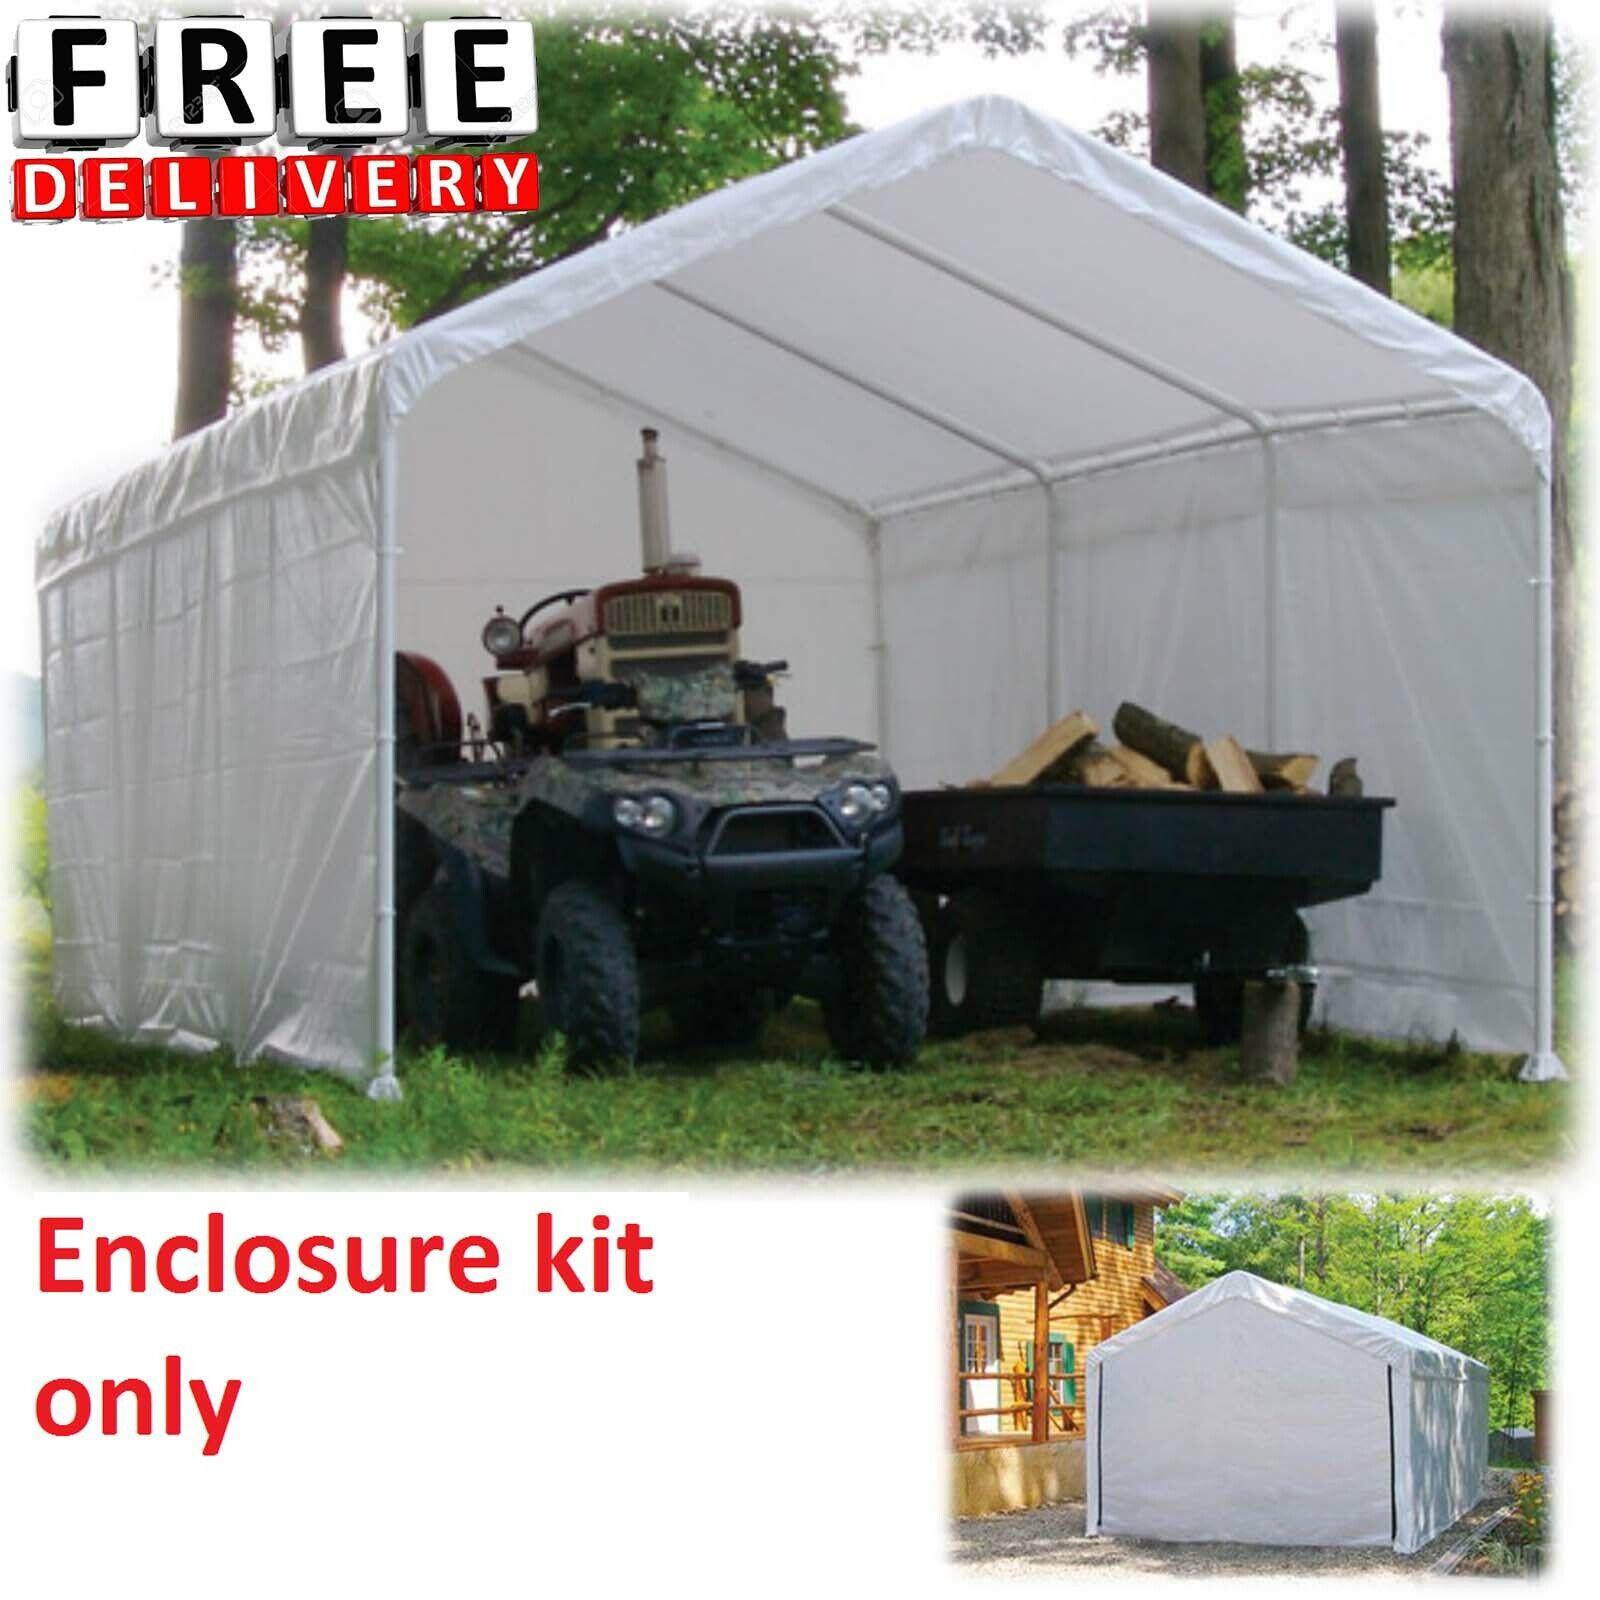 Canopy Enclosure Kit 12x30' Shelter Portable UV Protection G